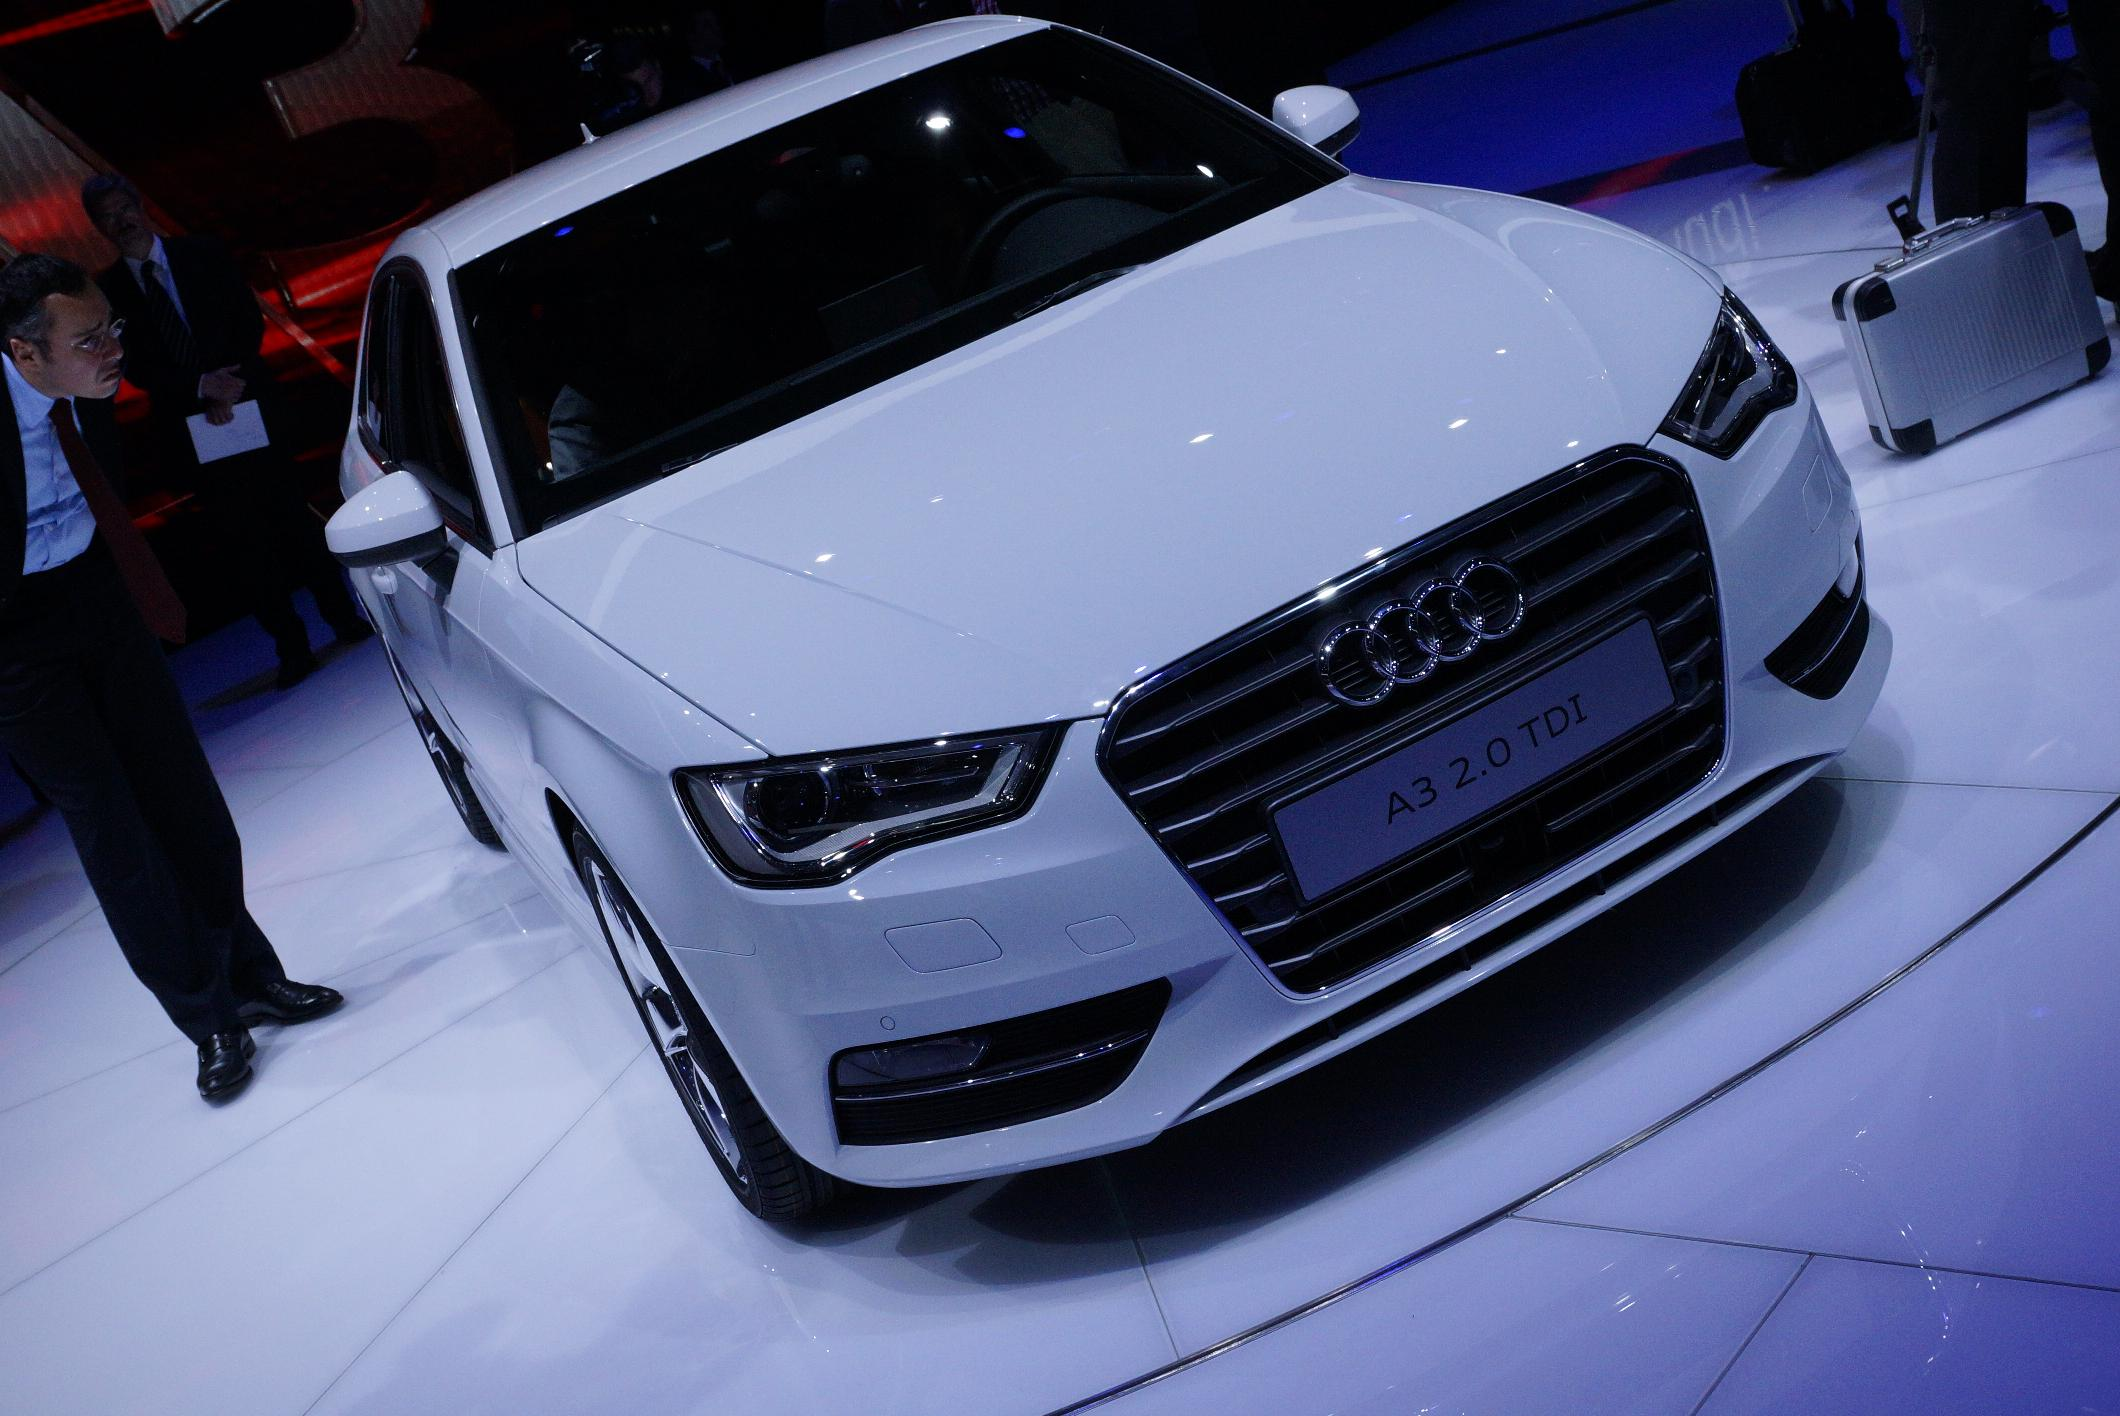 Audi A3 Geneva 2012 Front 2